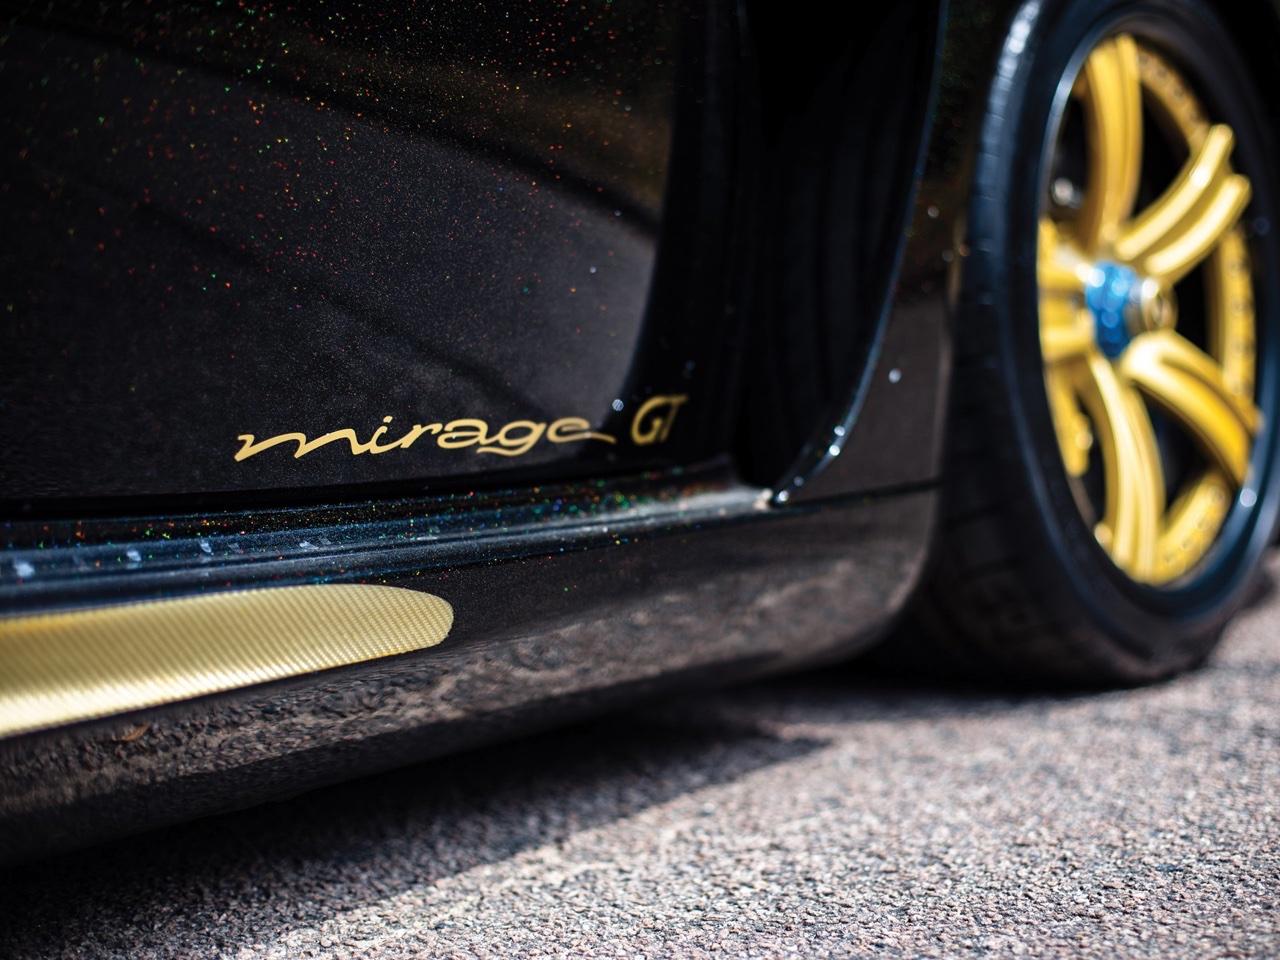 Porsche Carrera GT -> Gemballa Mirage GT Gold Edition : La caisse à Samuel ! 3